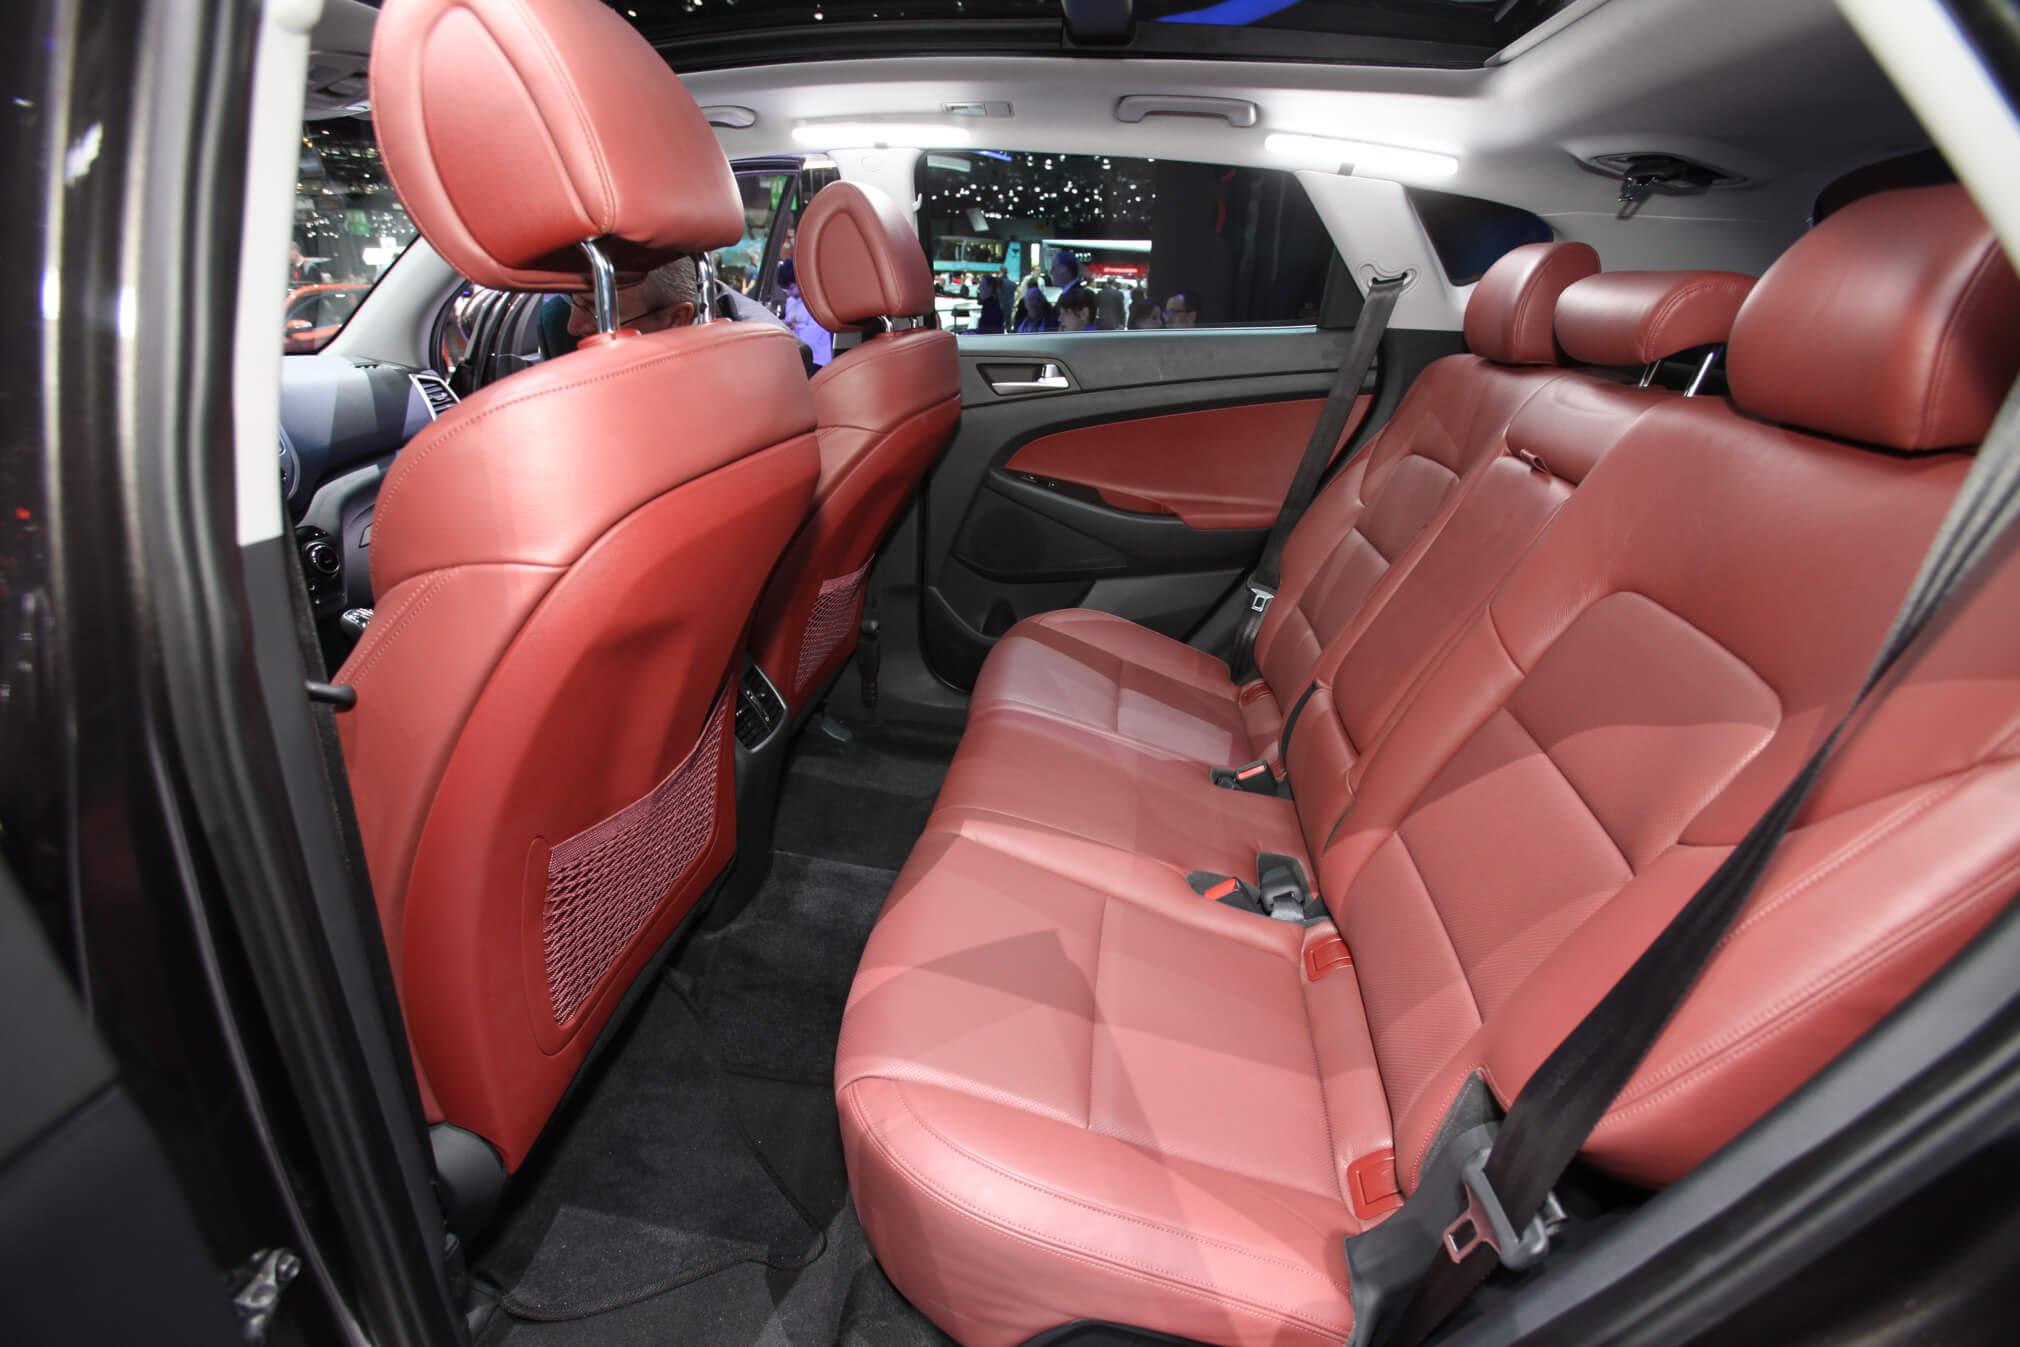 2016-Hyundai-Tucson-European-Spec-rear-interior-seats